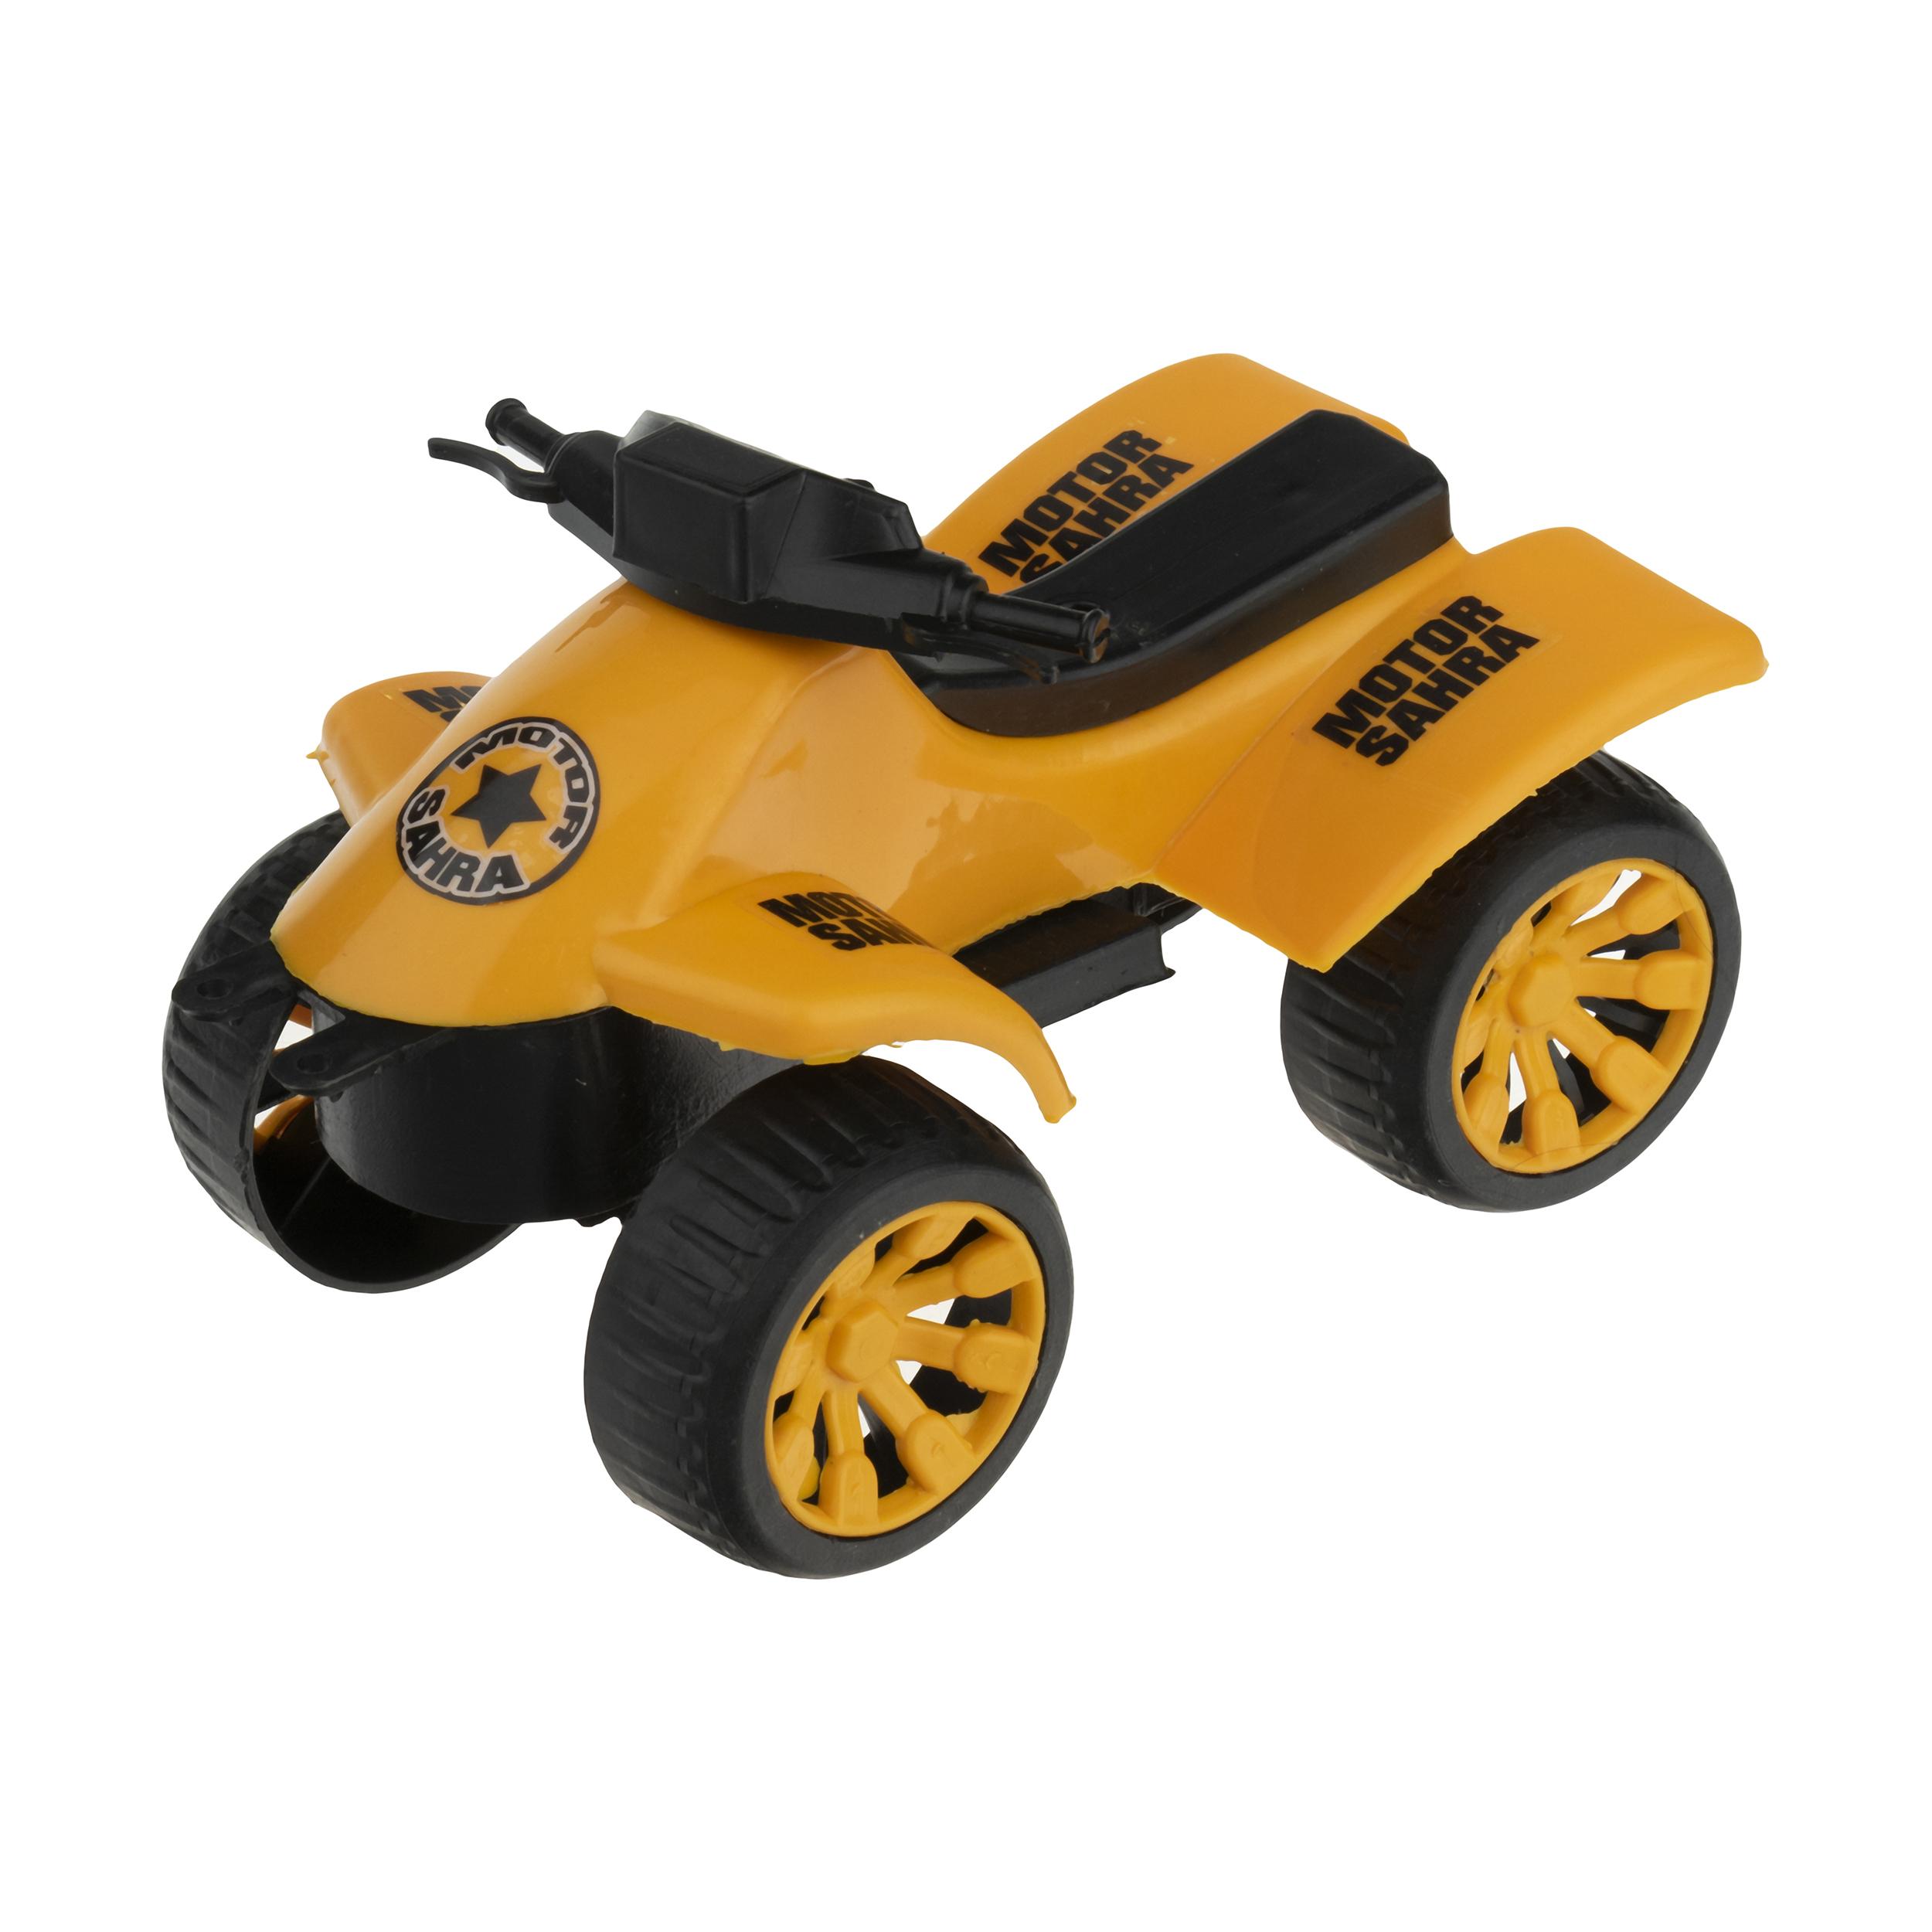 موتور بازی موتور سحر مدل A101